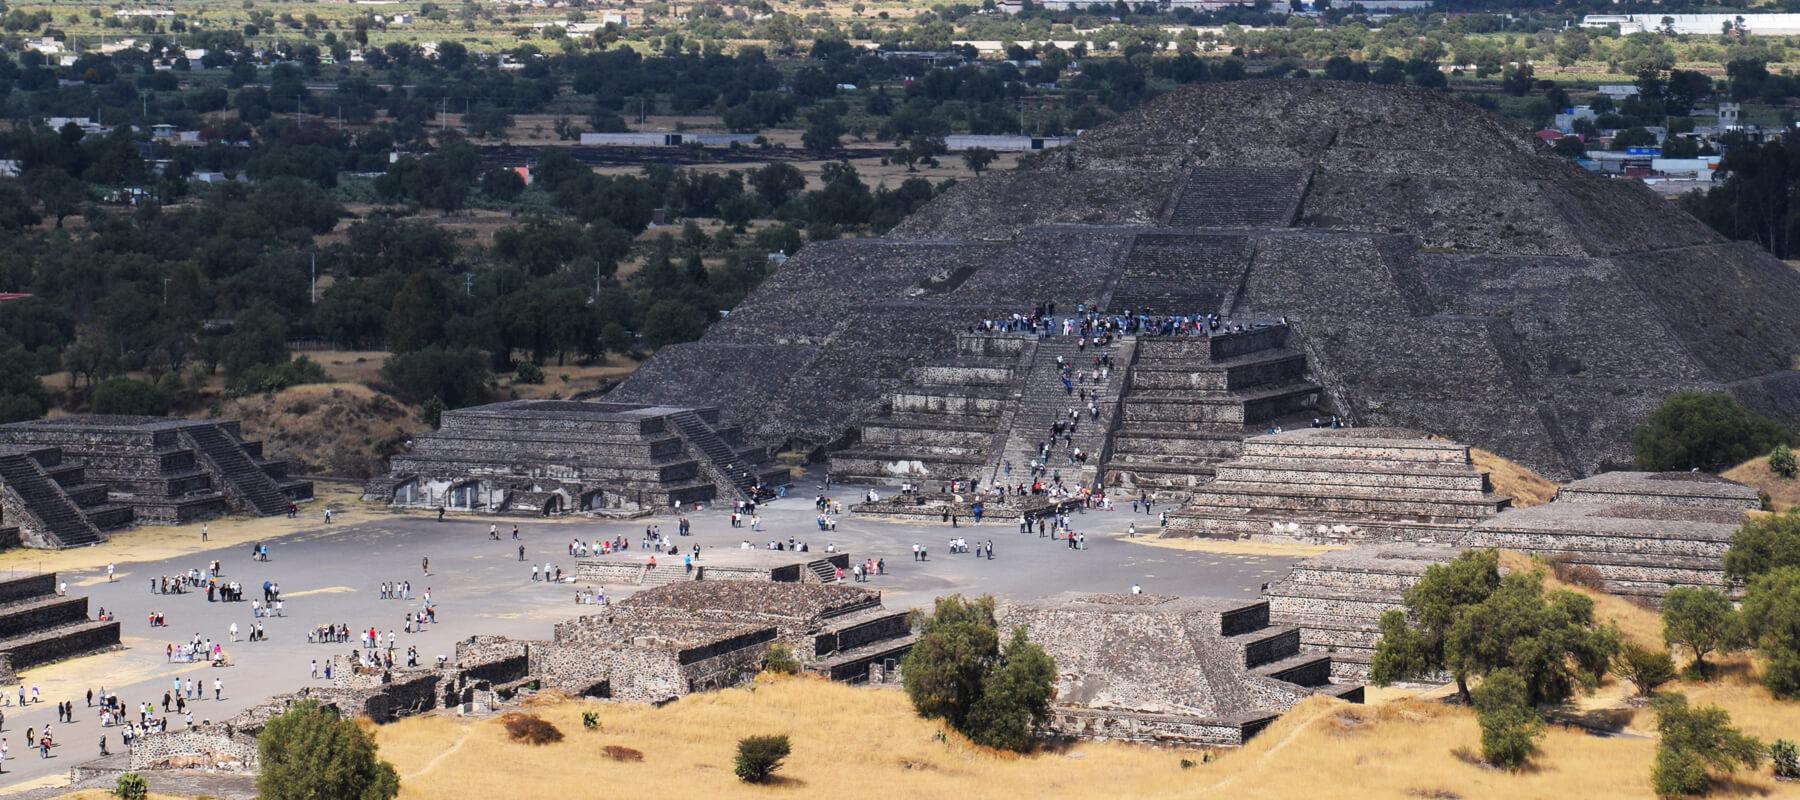 Mexico city et visite de Teotihuacan: Hola Mexico!